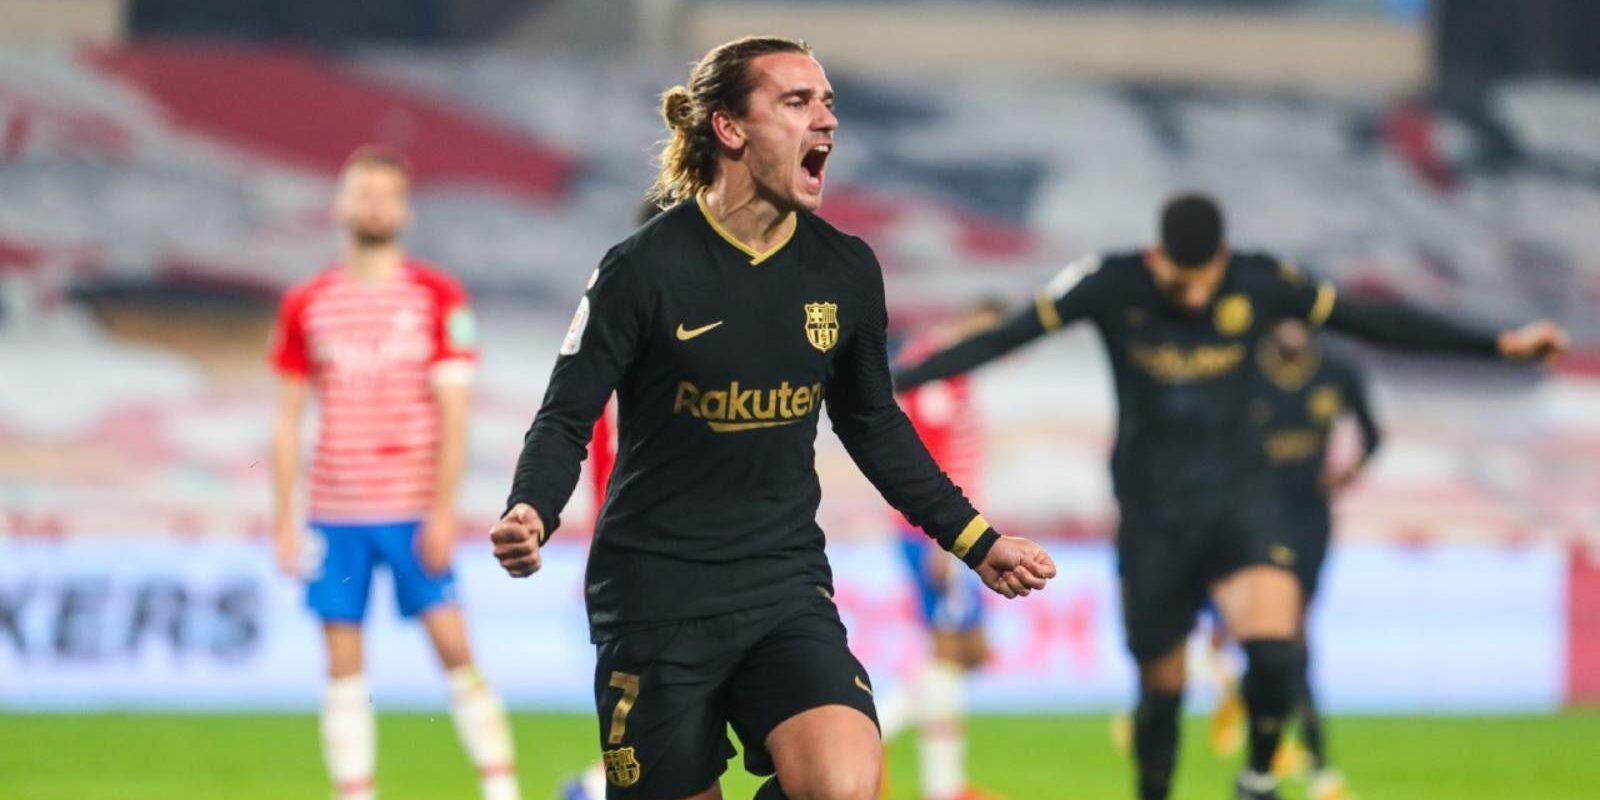 Griezmann celebra un gol al Nuevo los Cármenes | Europa Press